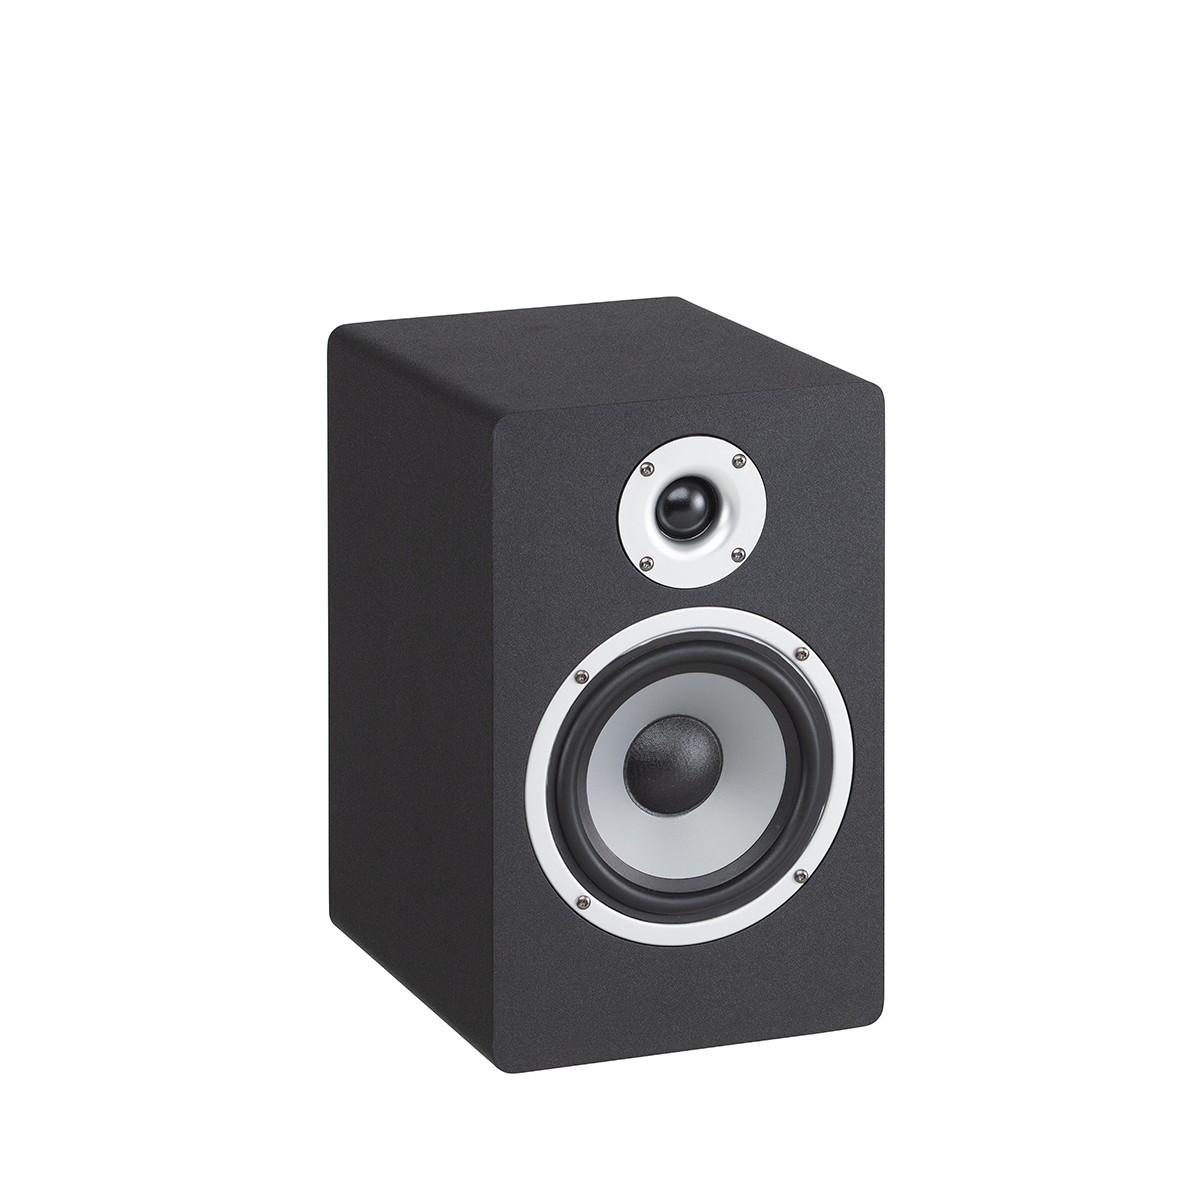 STUDIO MONITOR SOUNDSATION CLARITY A5 5